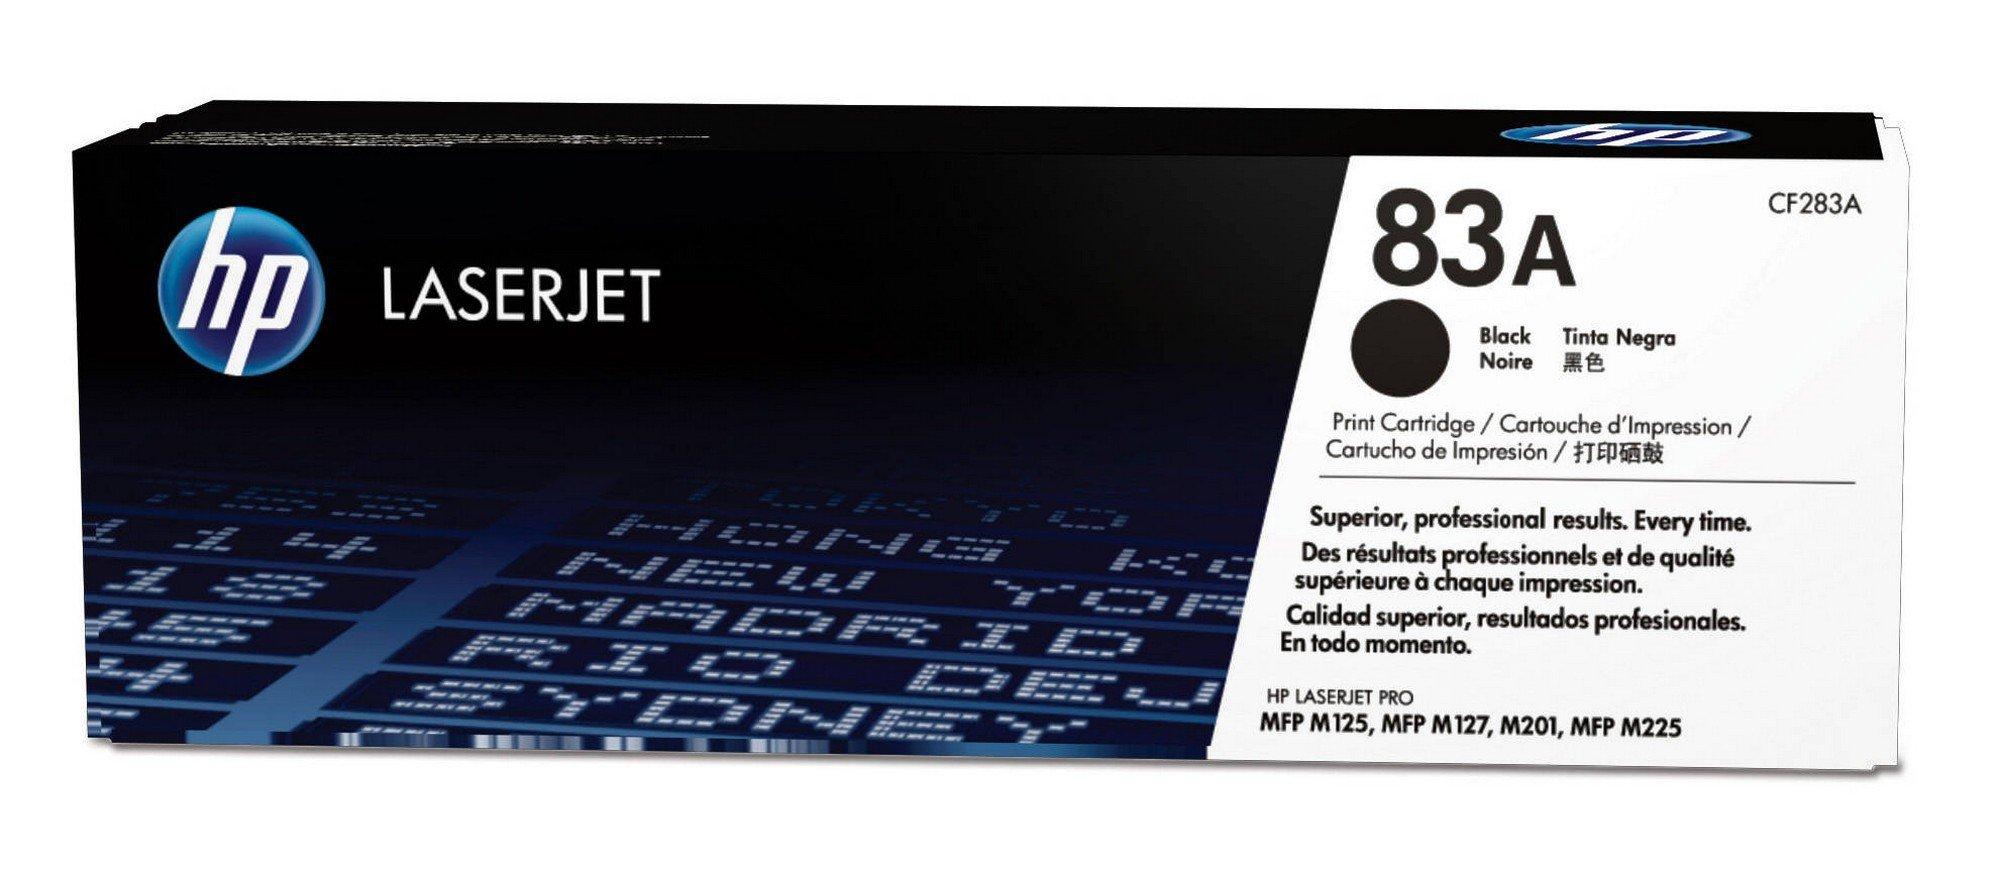 HP CF283A 83A Original LaserJet Toner Cartridge, Black, Single Pack